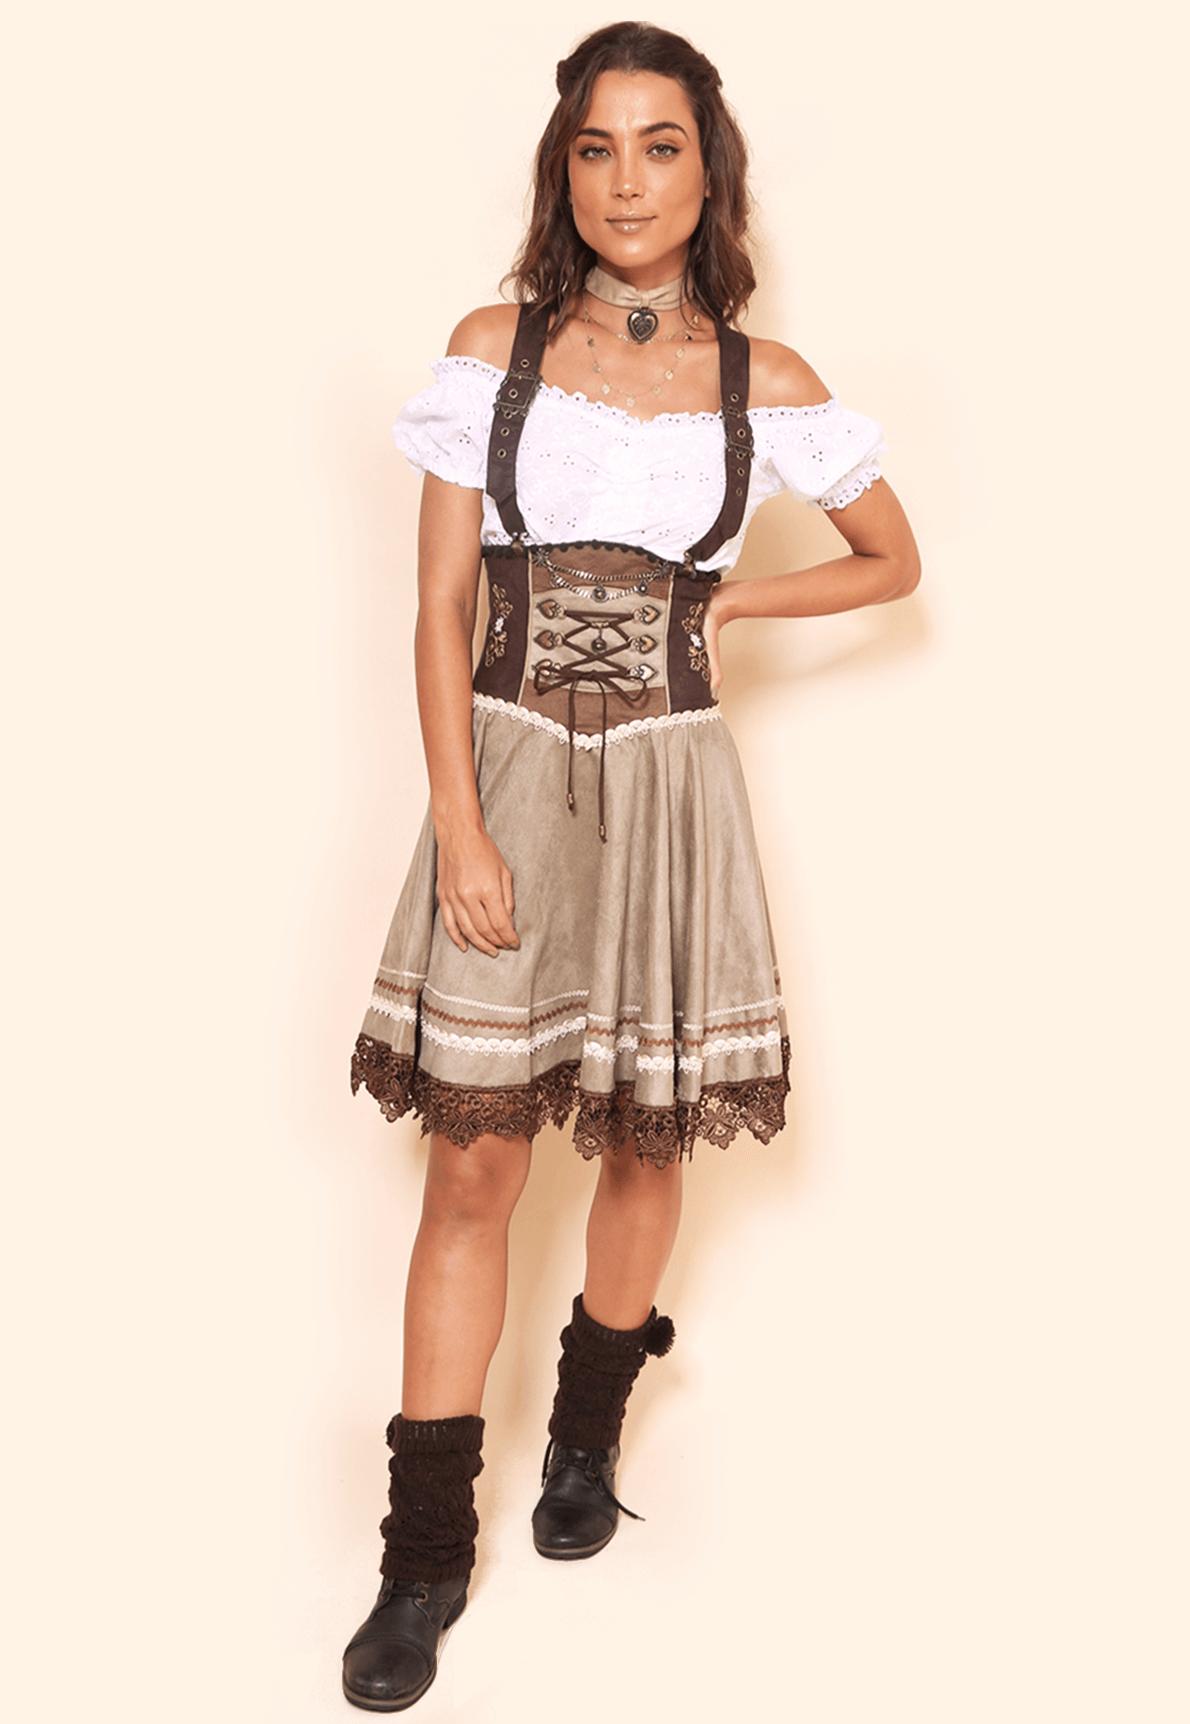 23673-vestido-mayla-marrom-branco-mundo-lolita-02